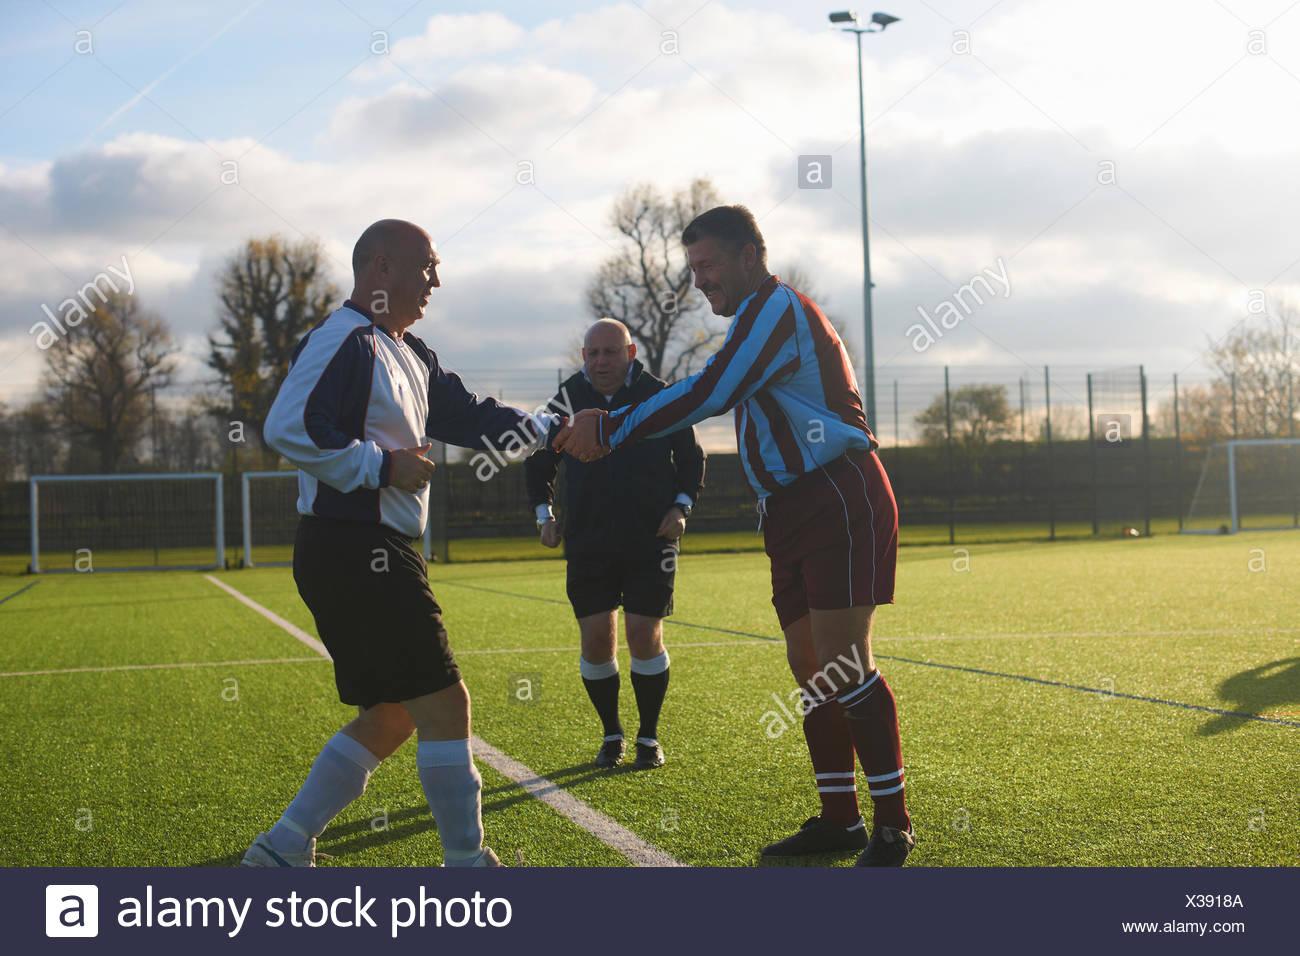 Football players starting game - Stock Image